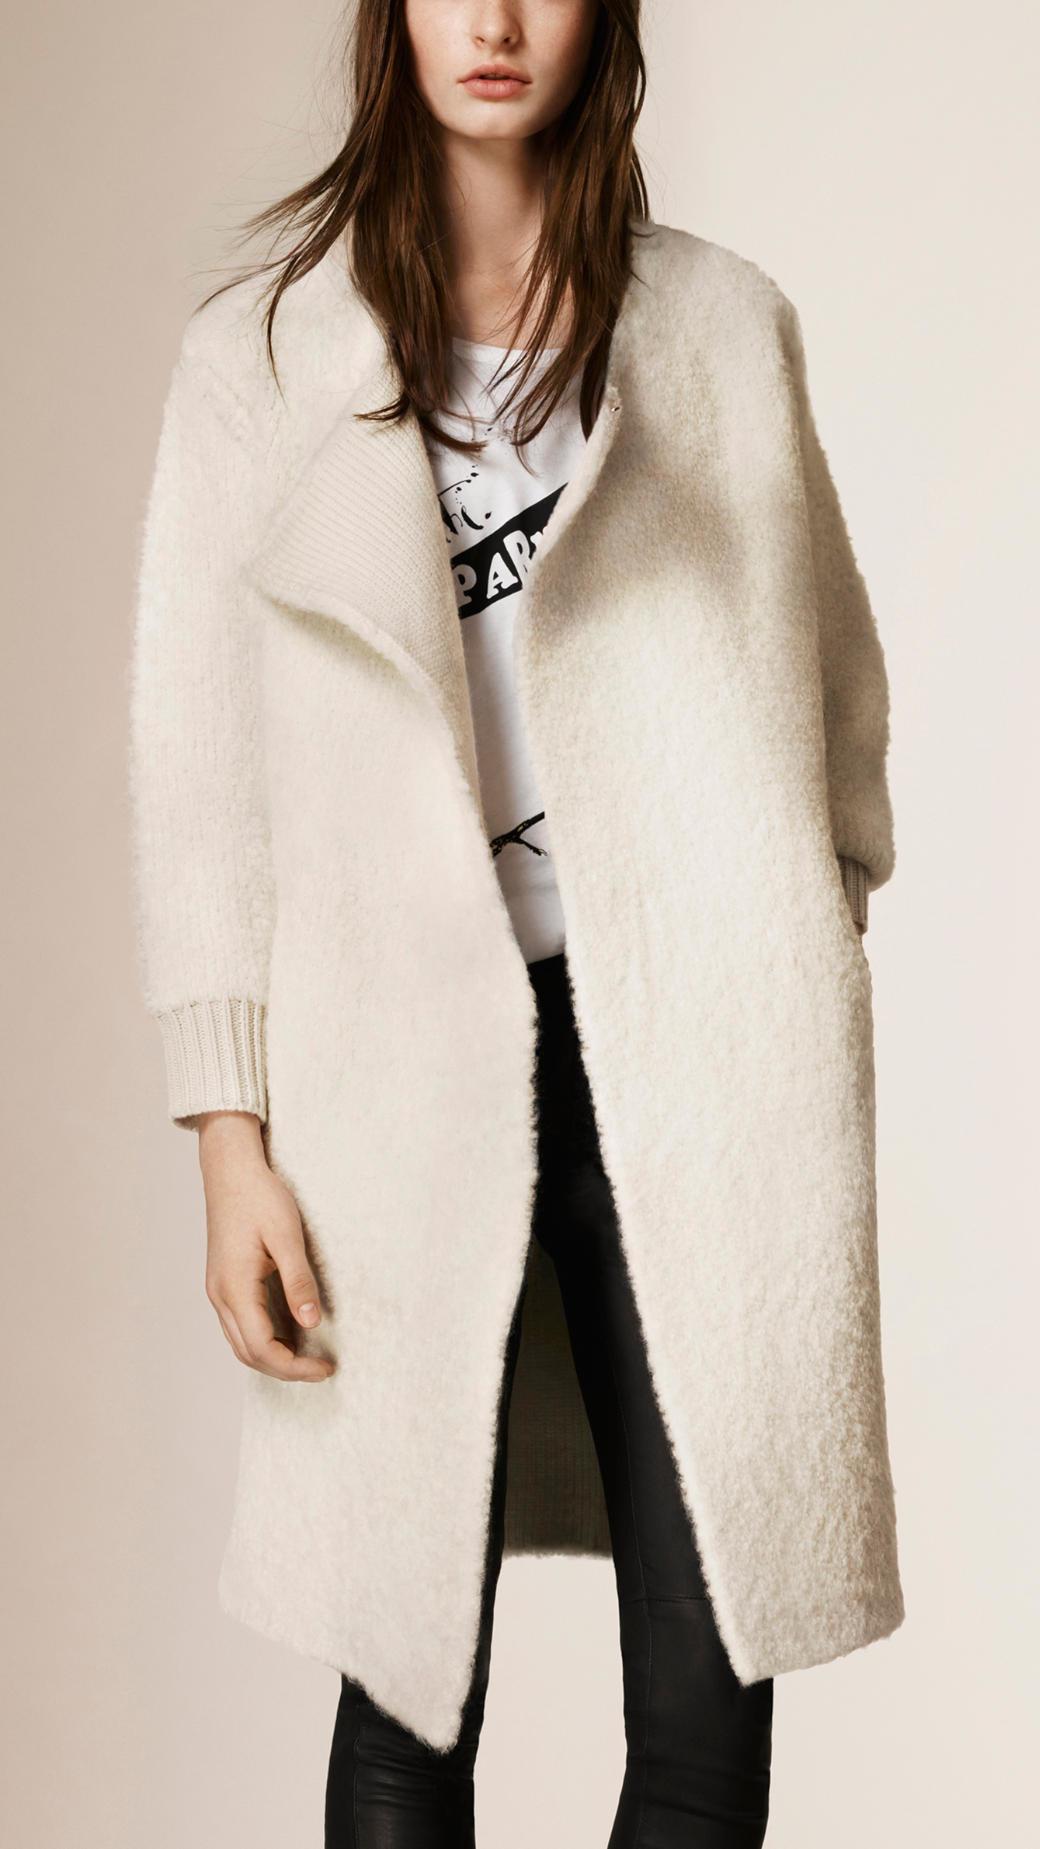 Burberry Wool Alpaca Cashmere Cardigan Coat in Natural | Lyst